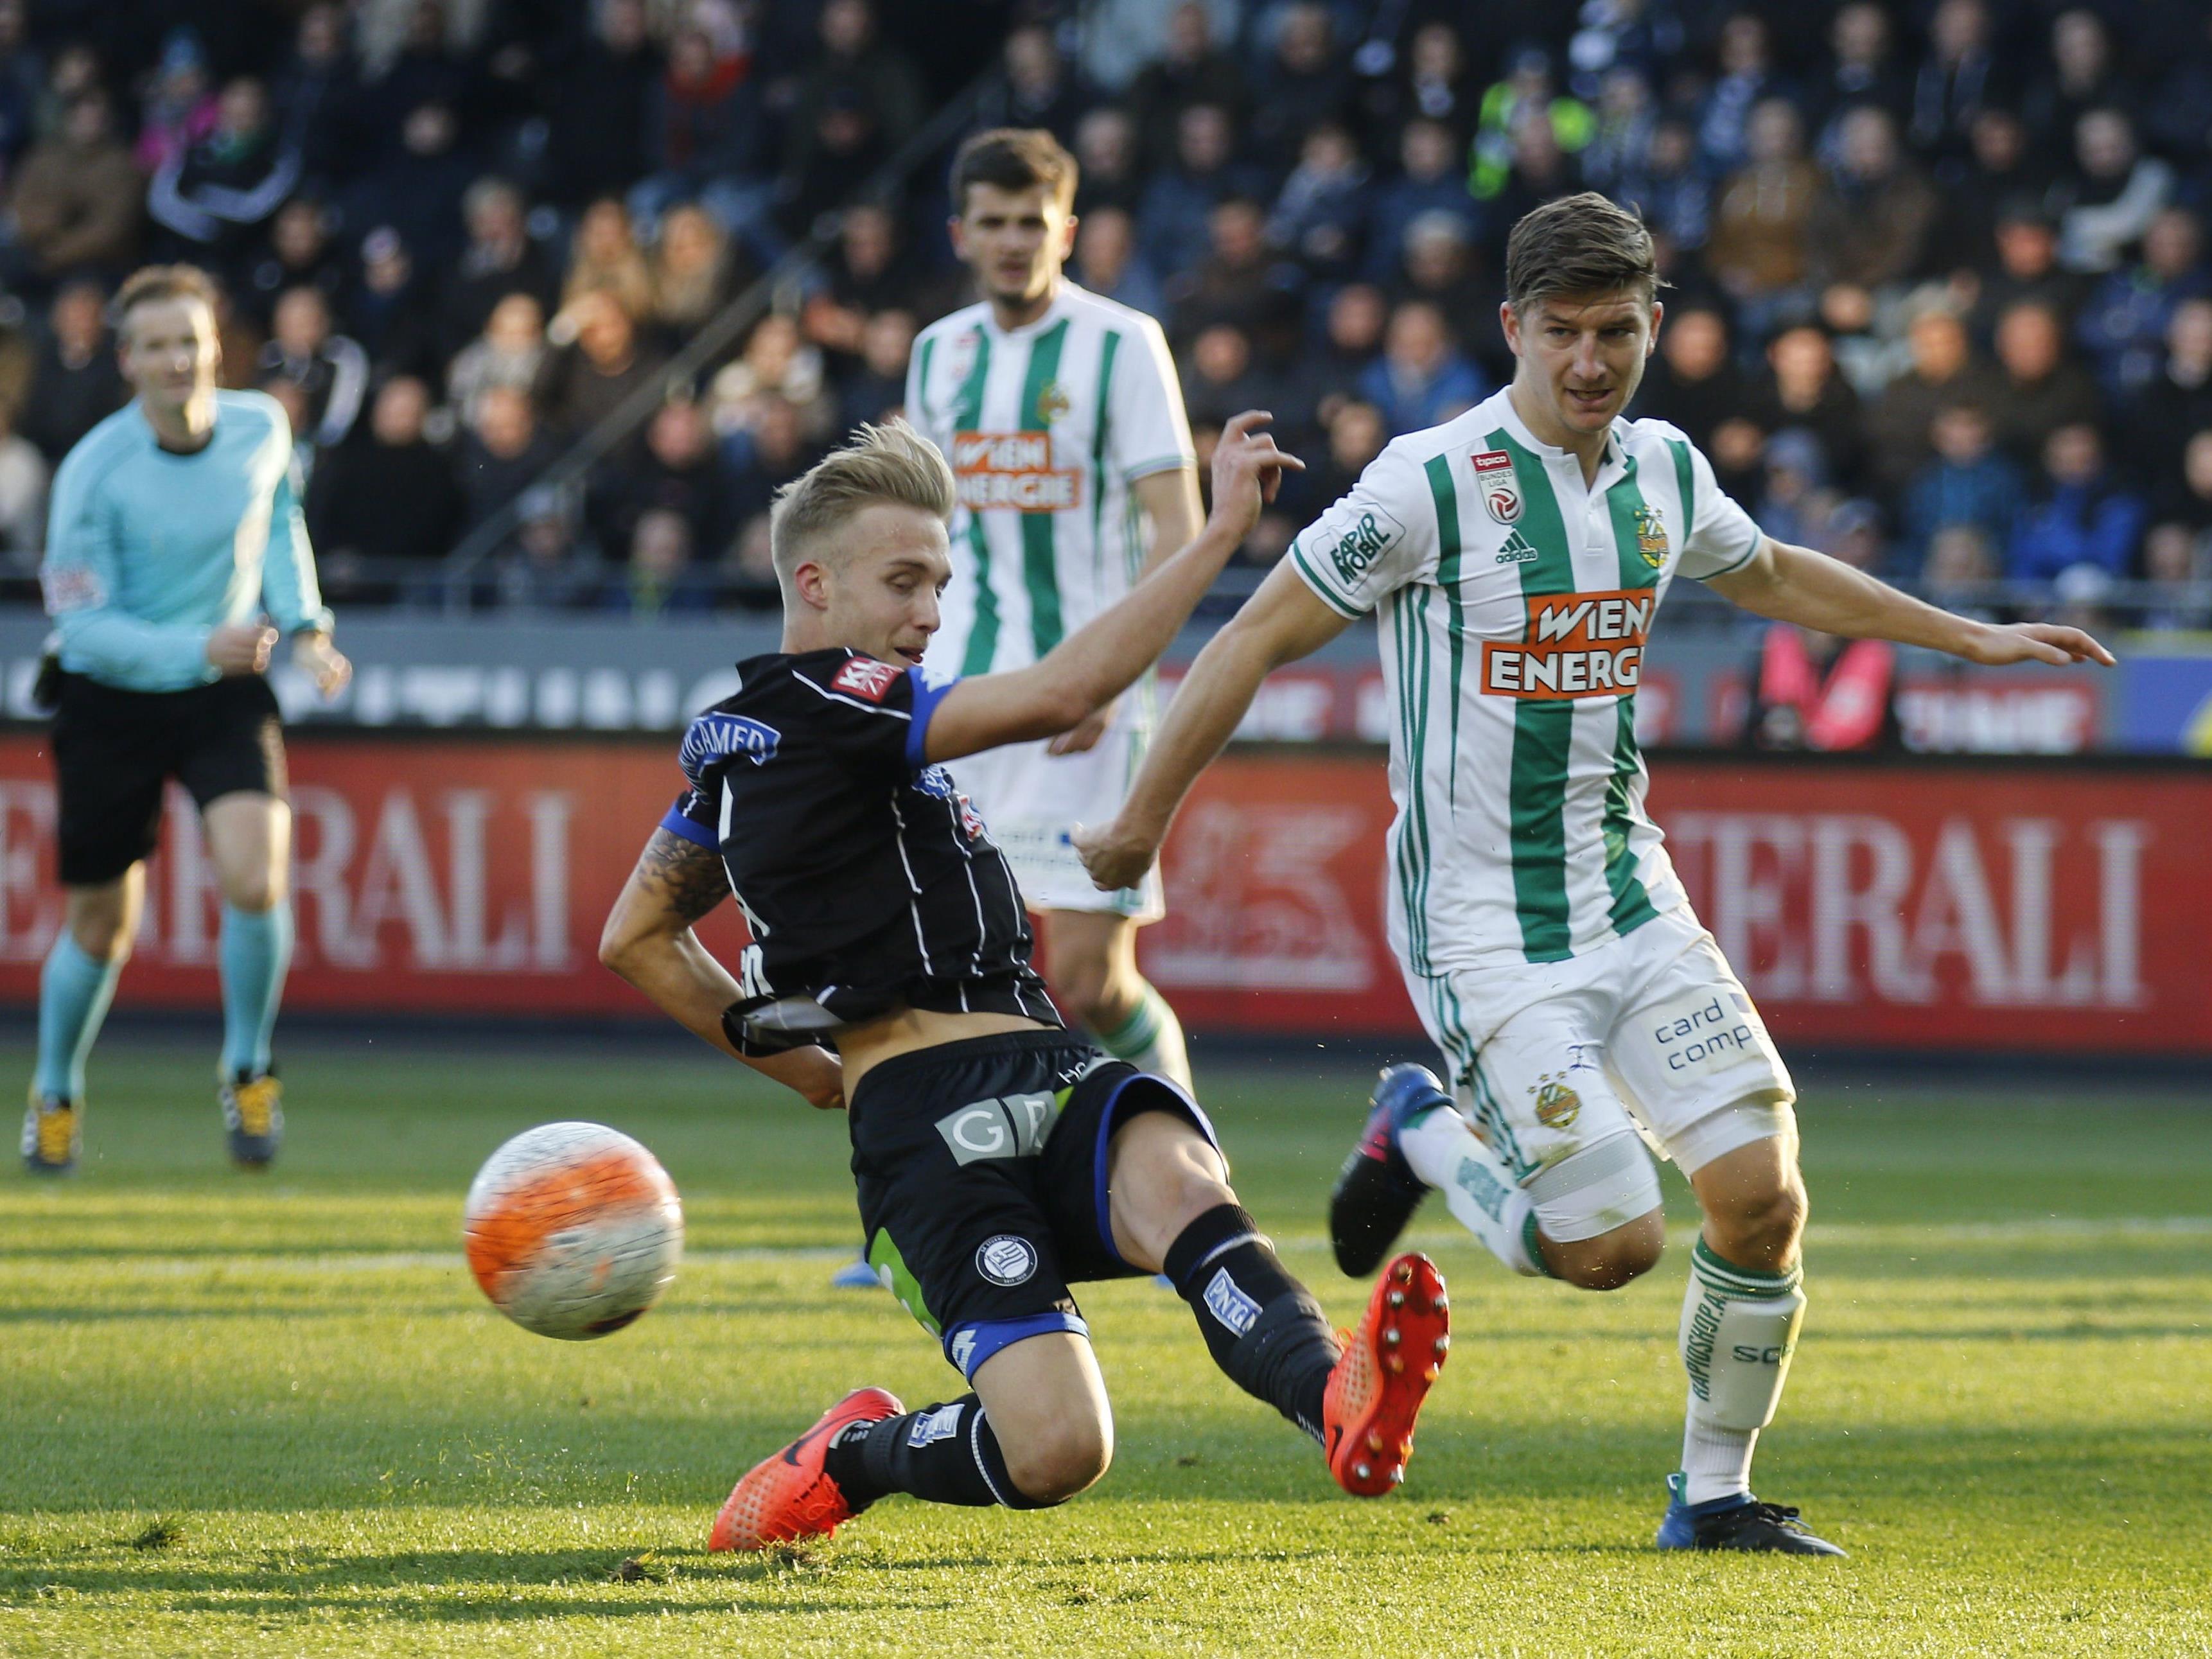 Rapid verlor mit 1:2 bei Sturm Graz.